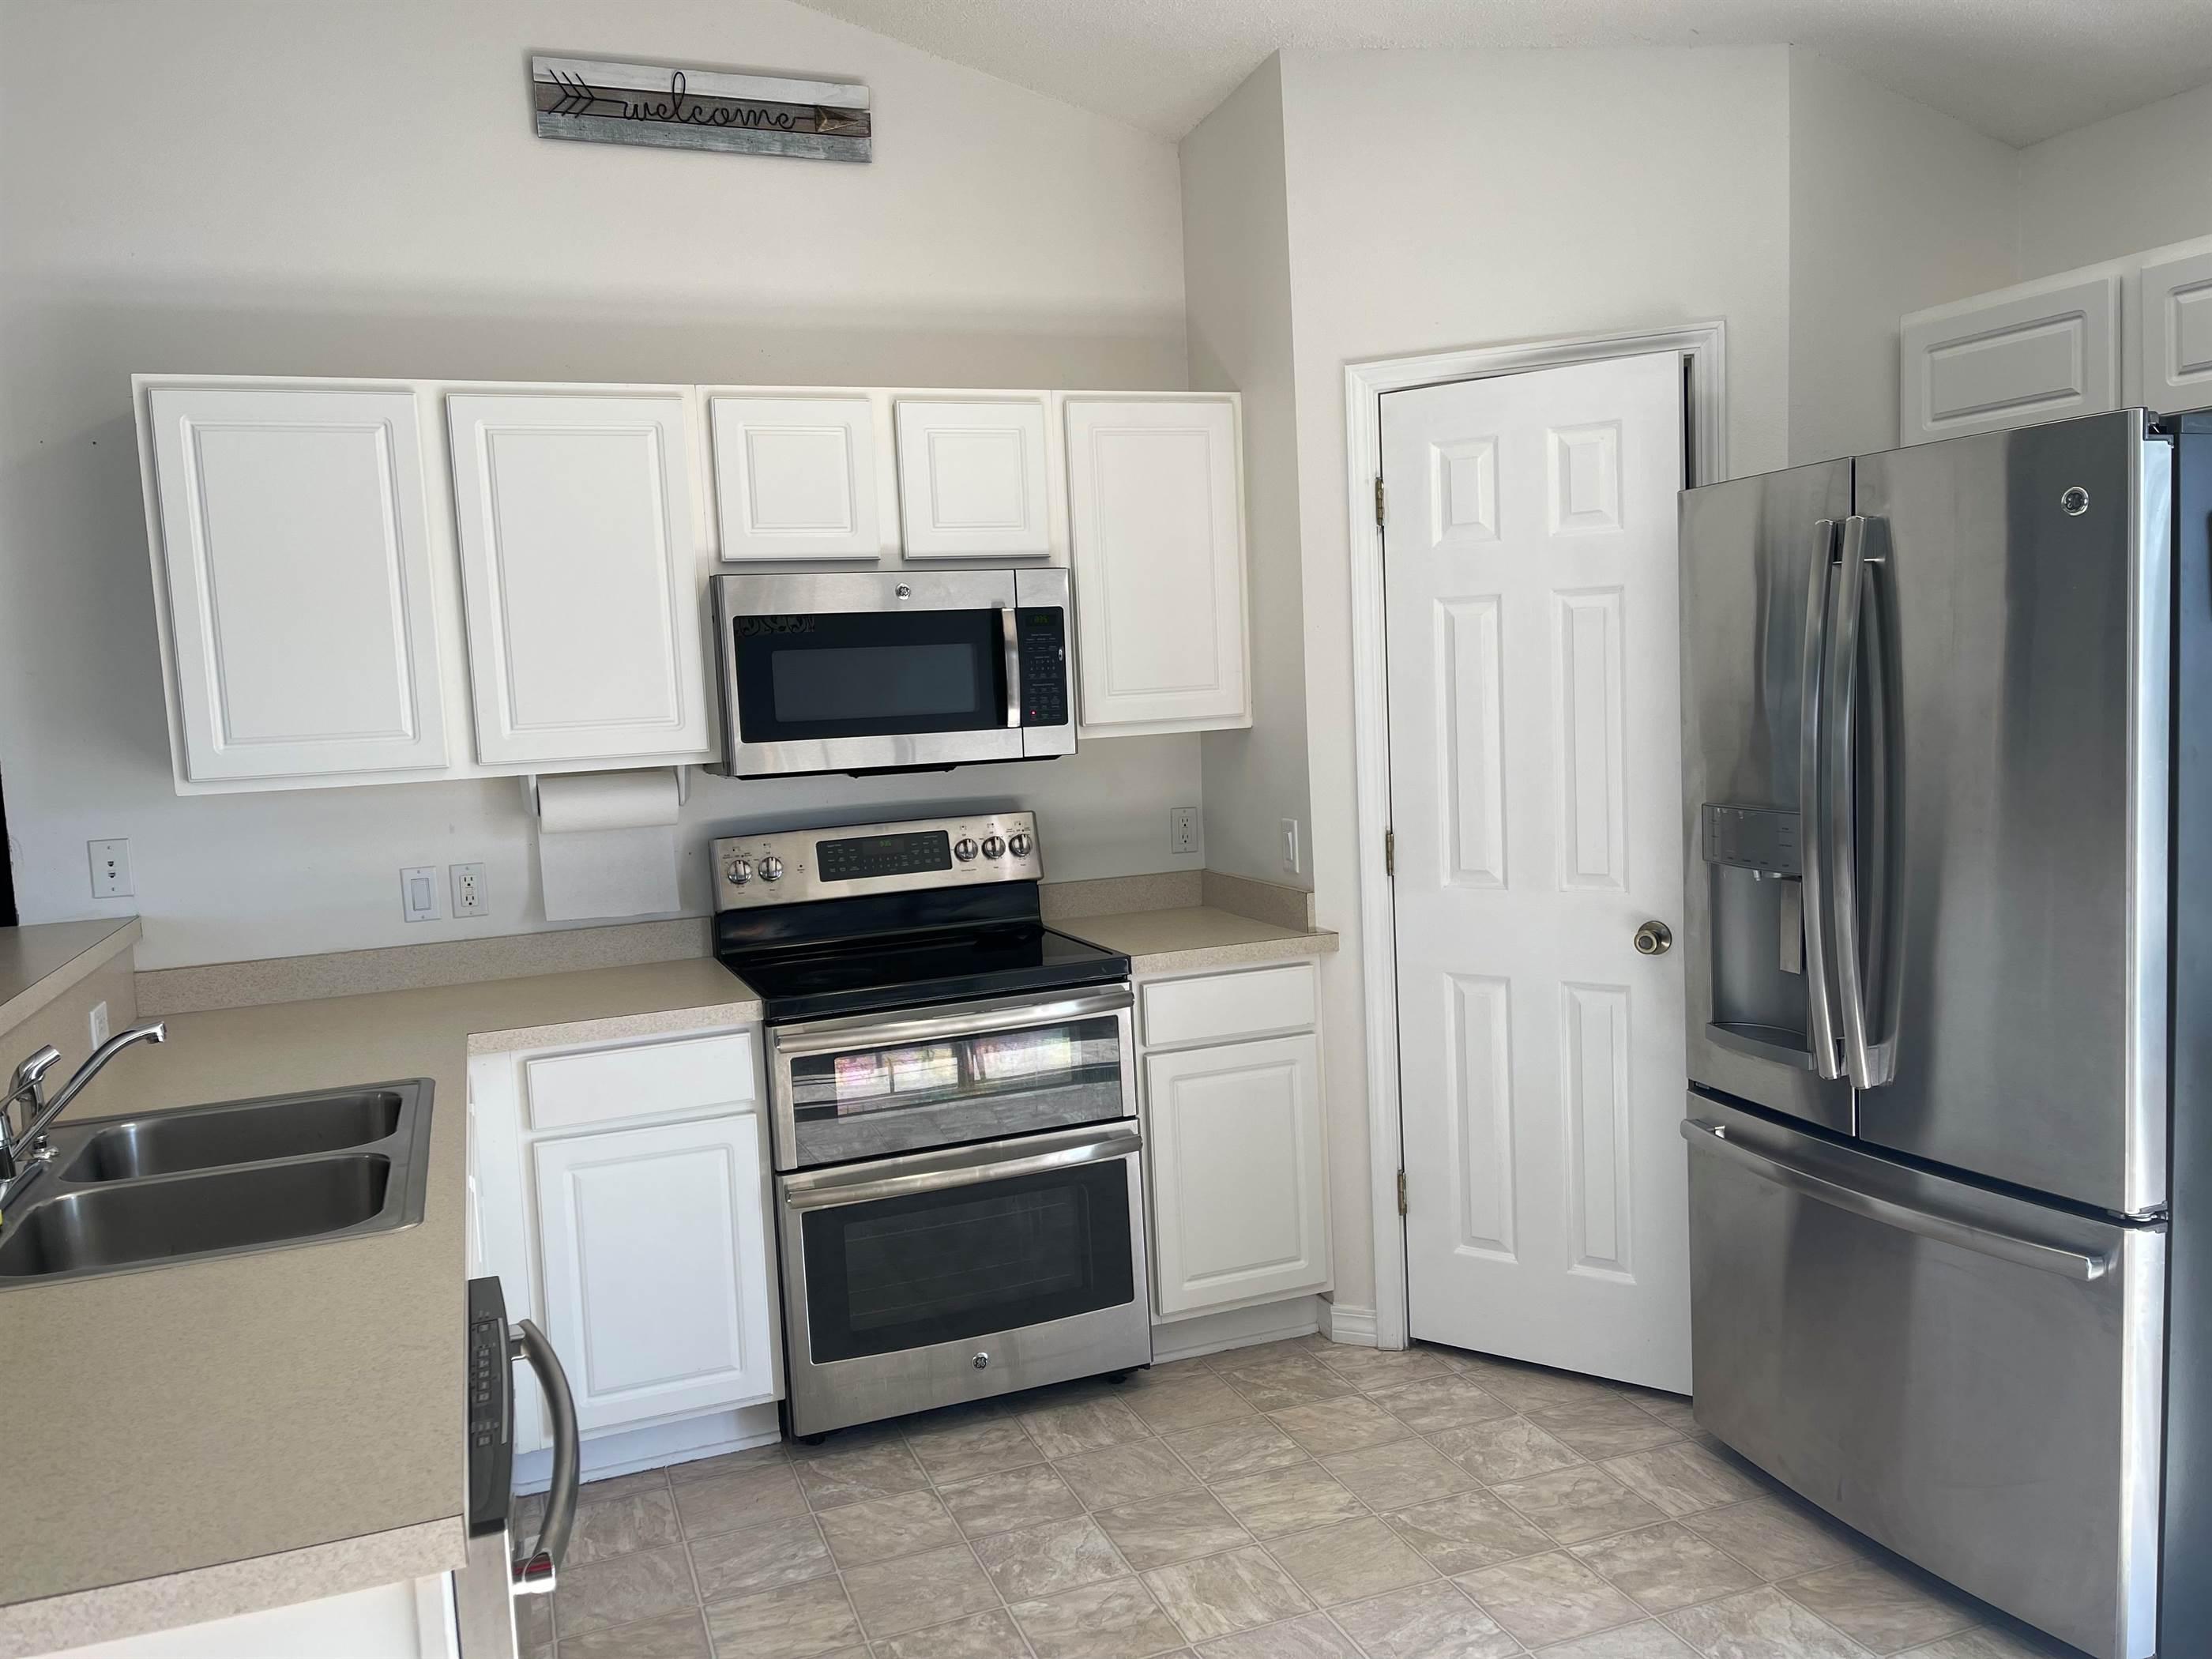 127 Nivana Drive, Crestview, FL 32536